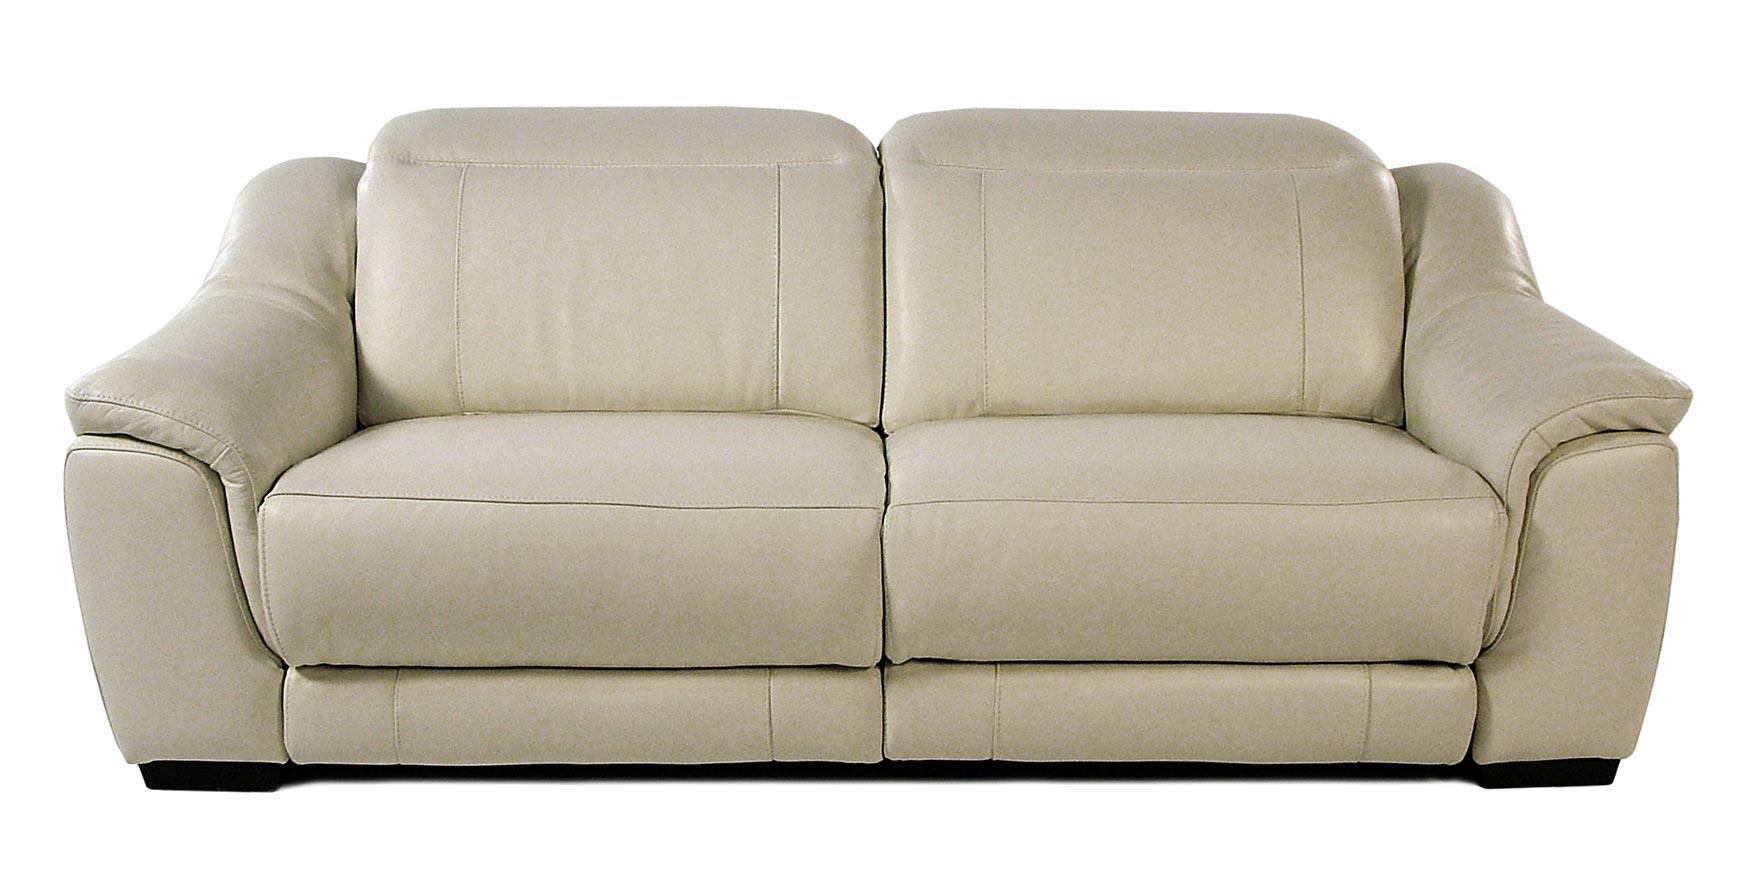 Giovani Illusion Power Reclining Leather Sofa - Item Number: 9557-2.5S2VA